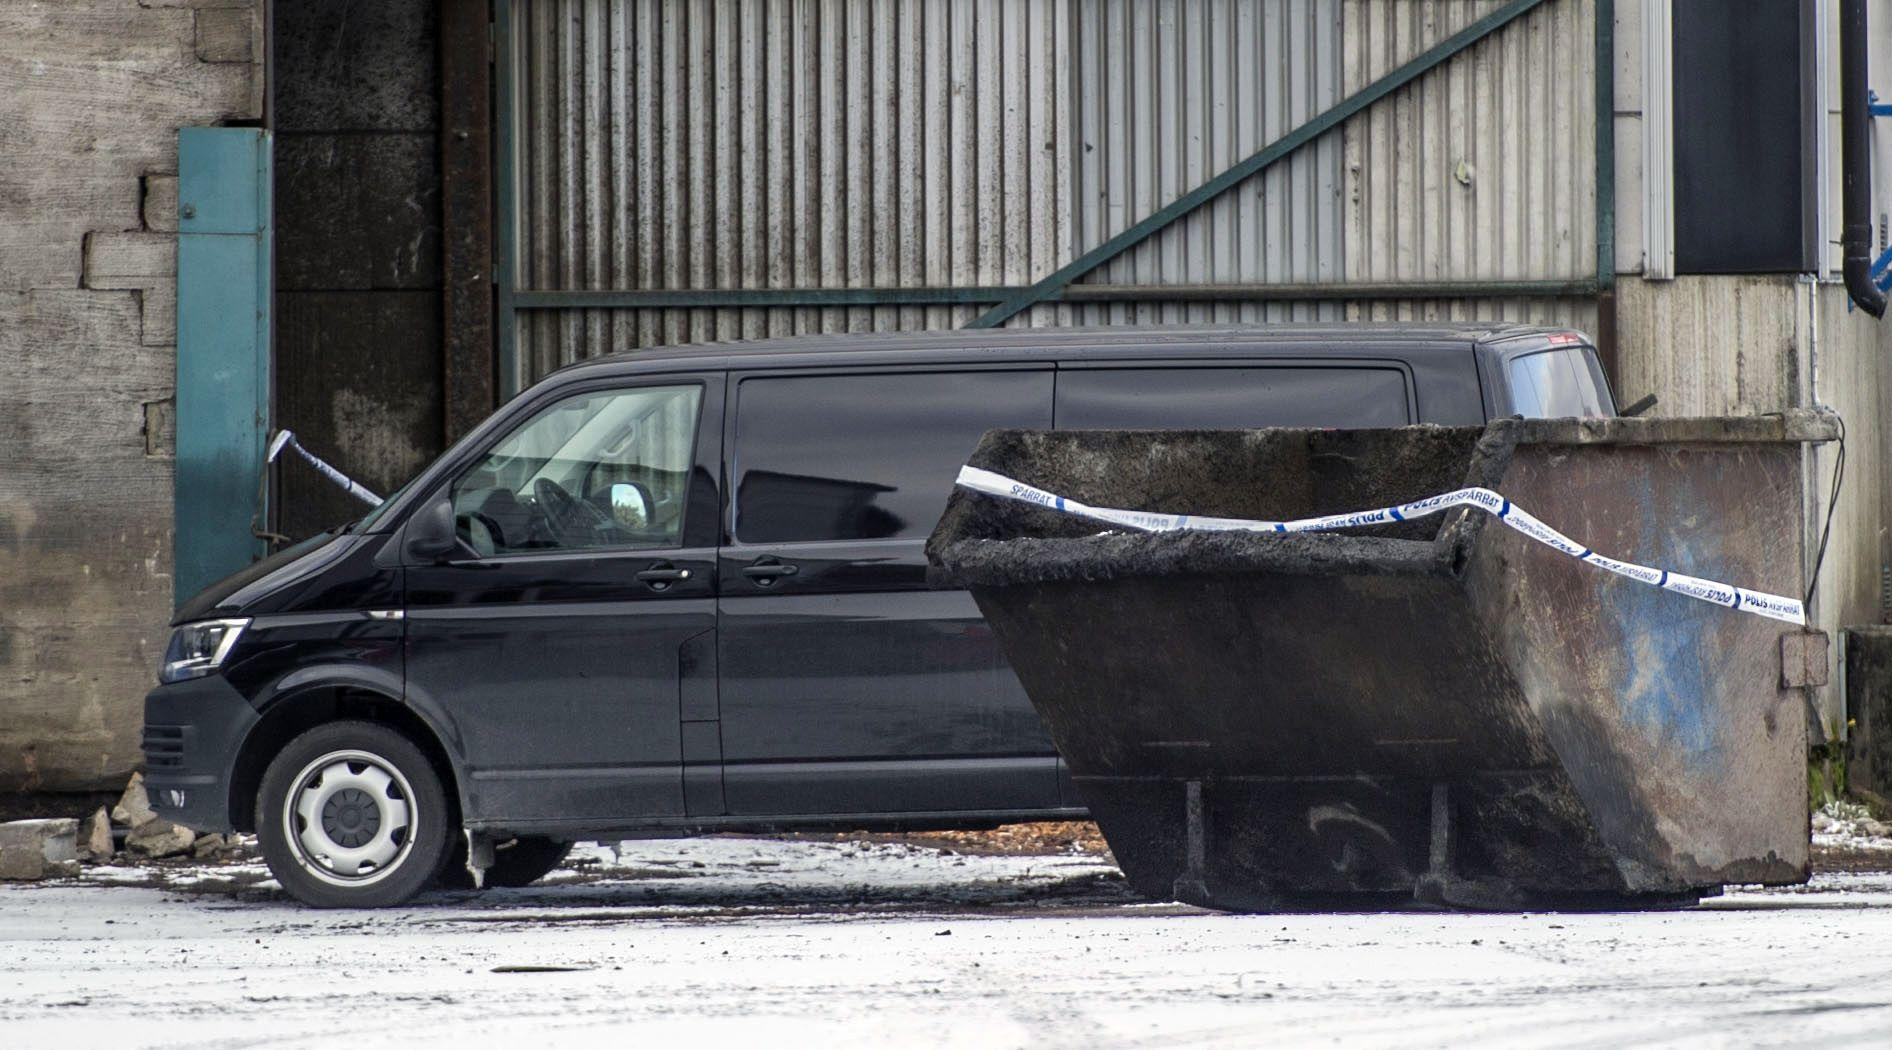 Det fordon som polisen undersökte i samband med polisens tillslag.